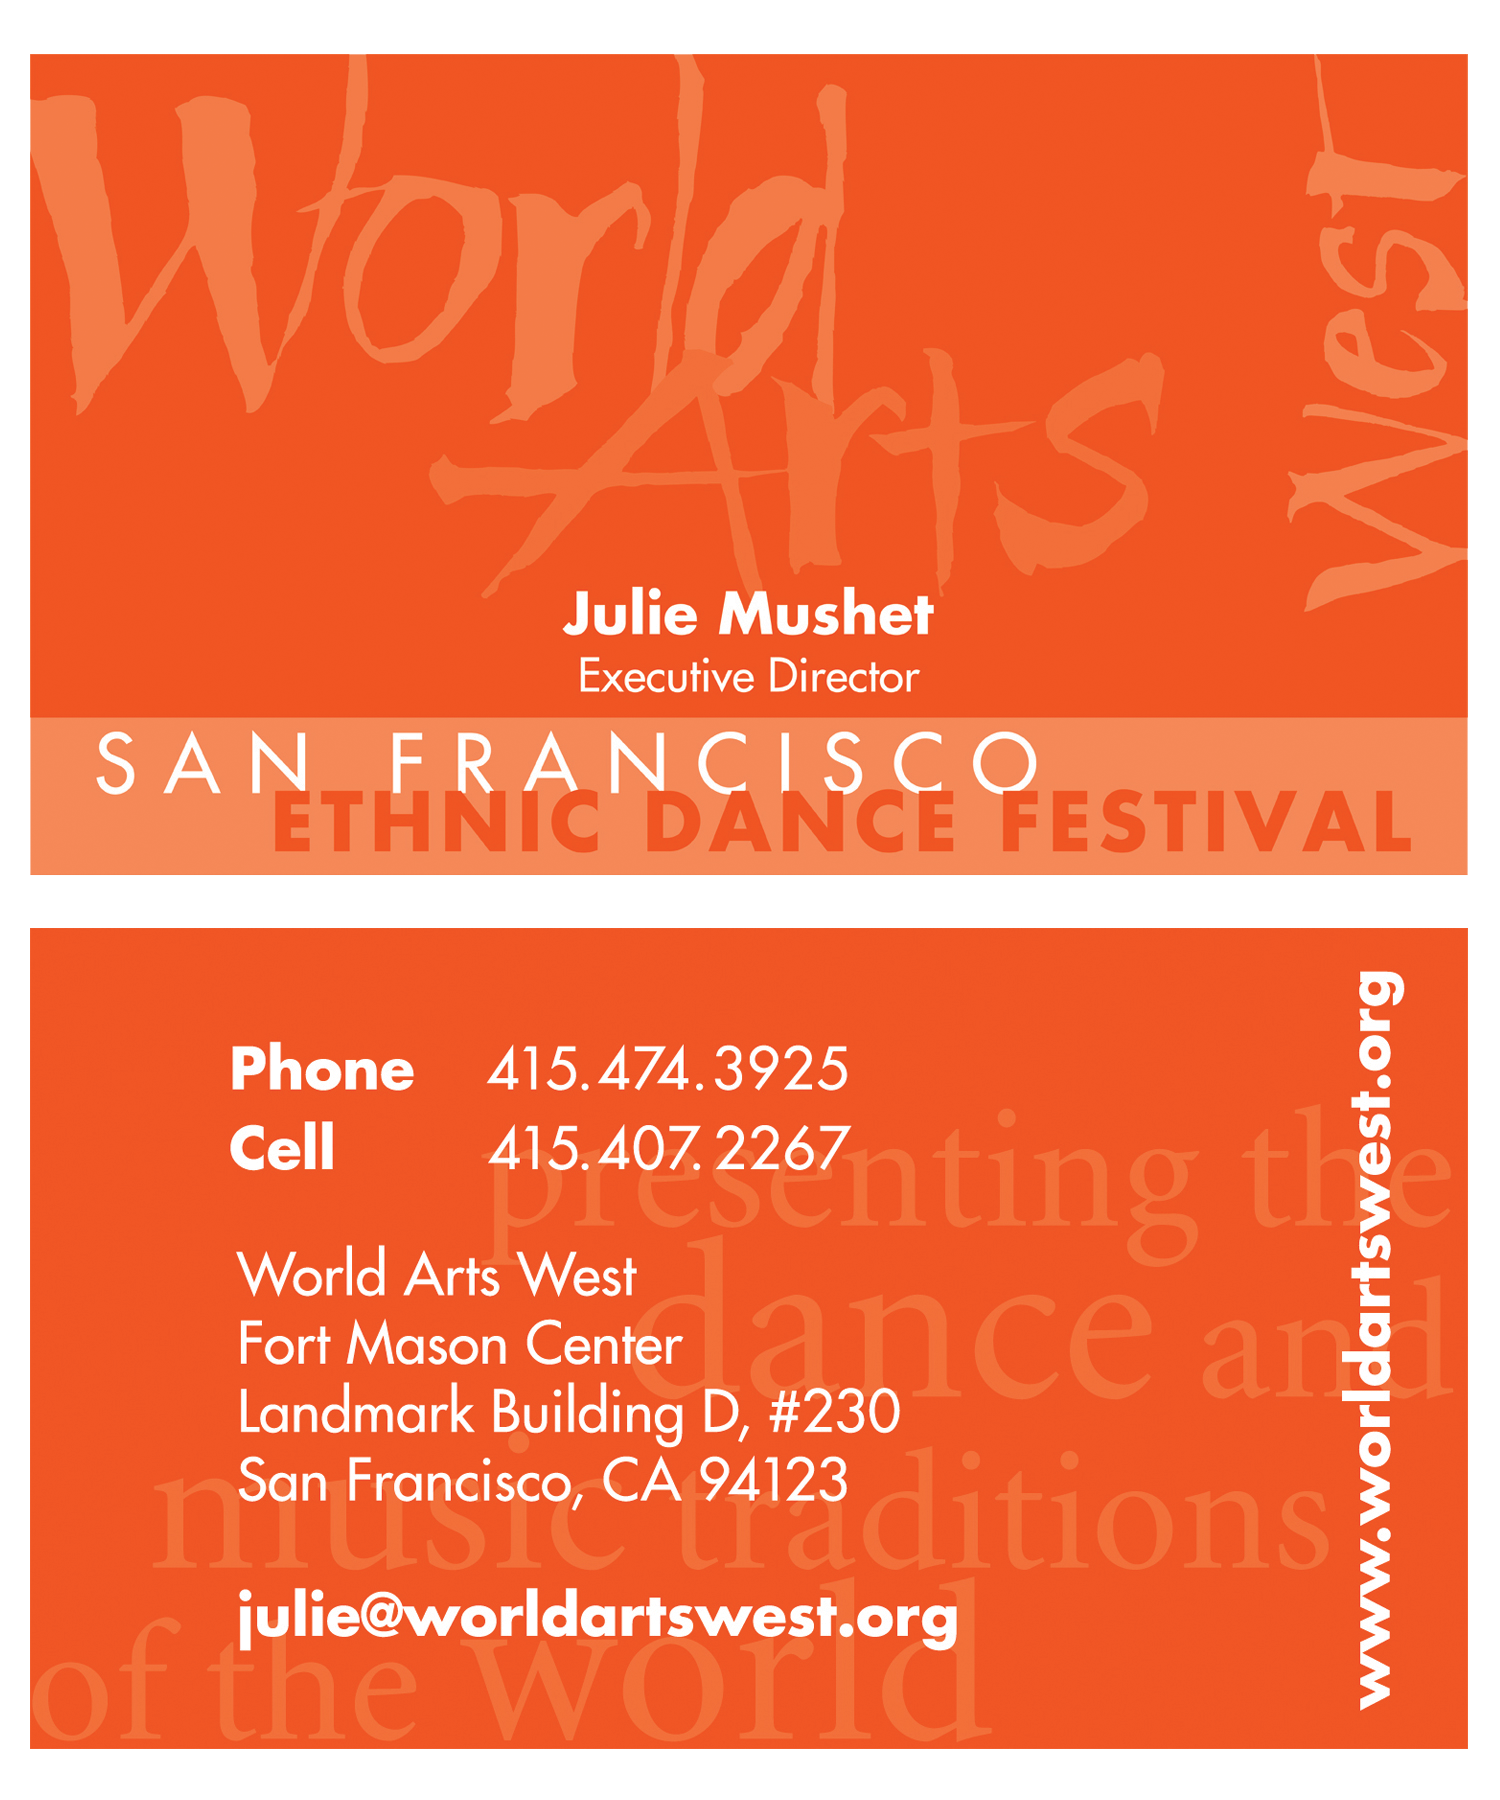 World Arts West Business Card